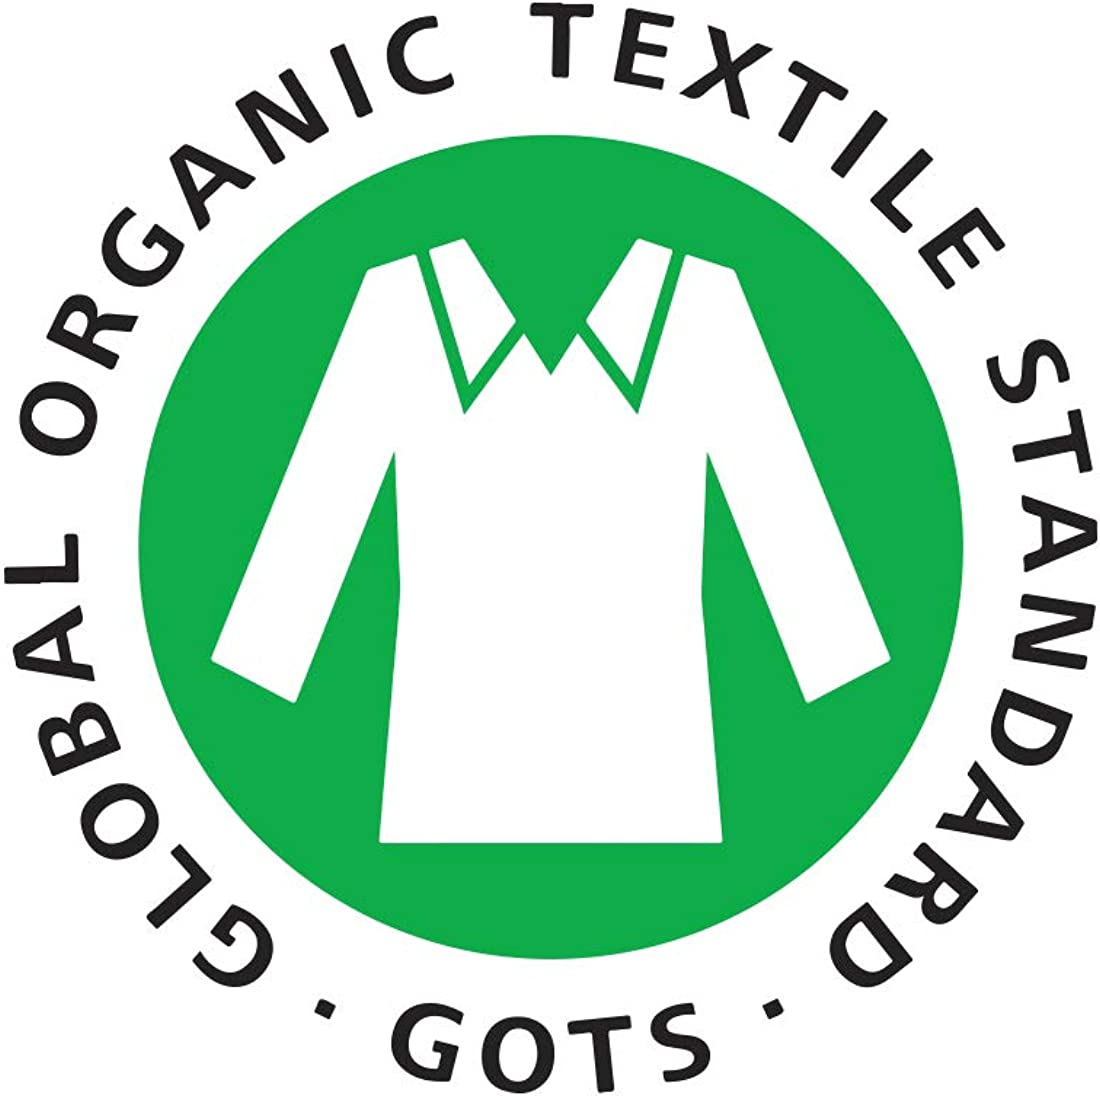 Criss Cross Softsens Baby Certified Organic Cotton Unisex Baby Knit Pants